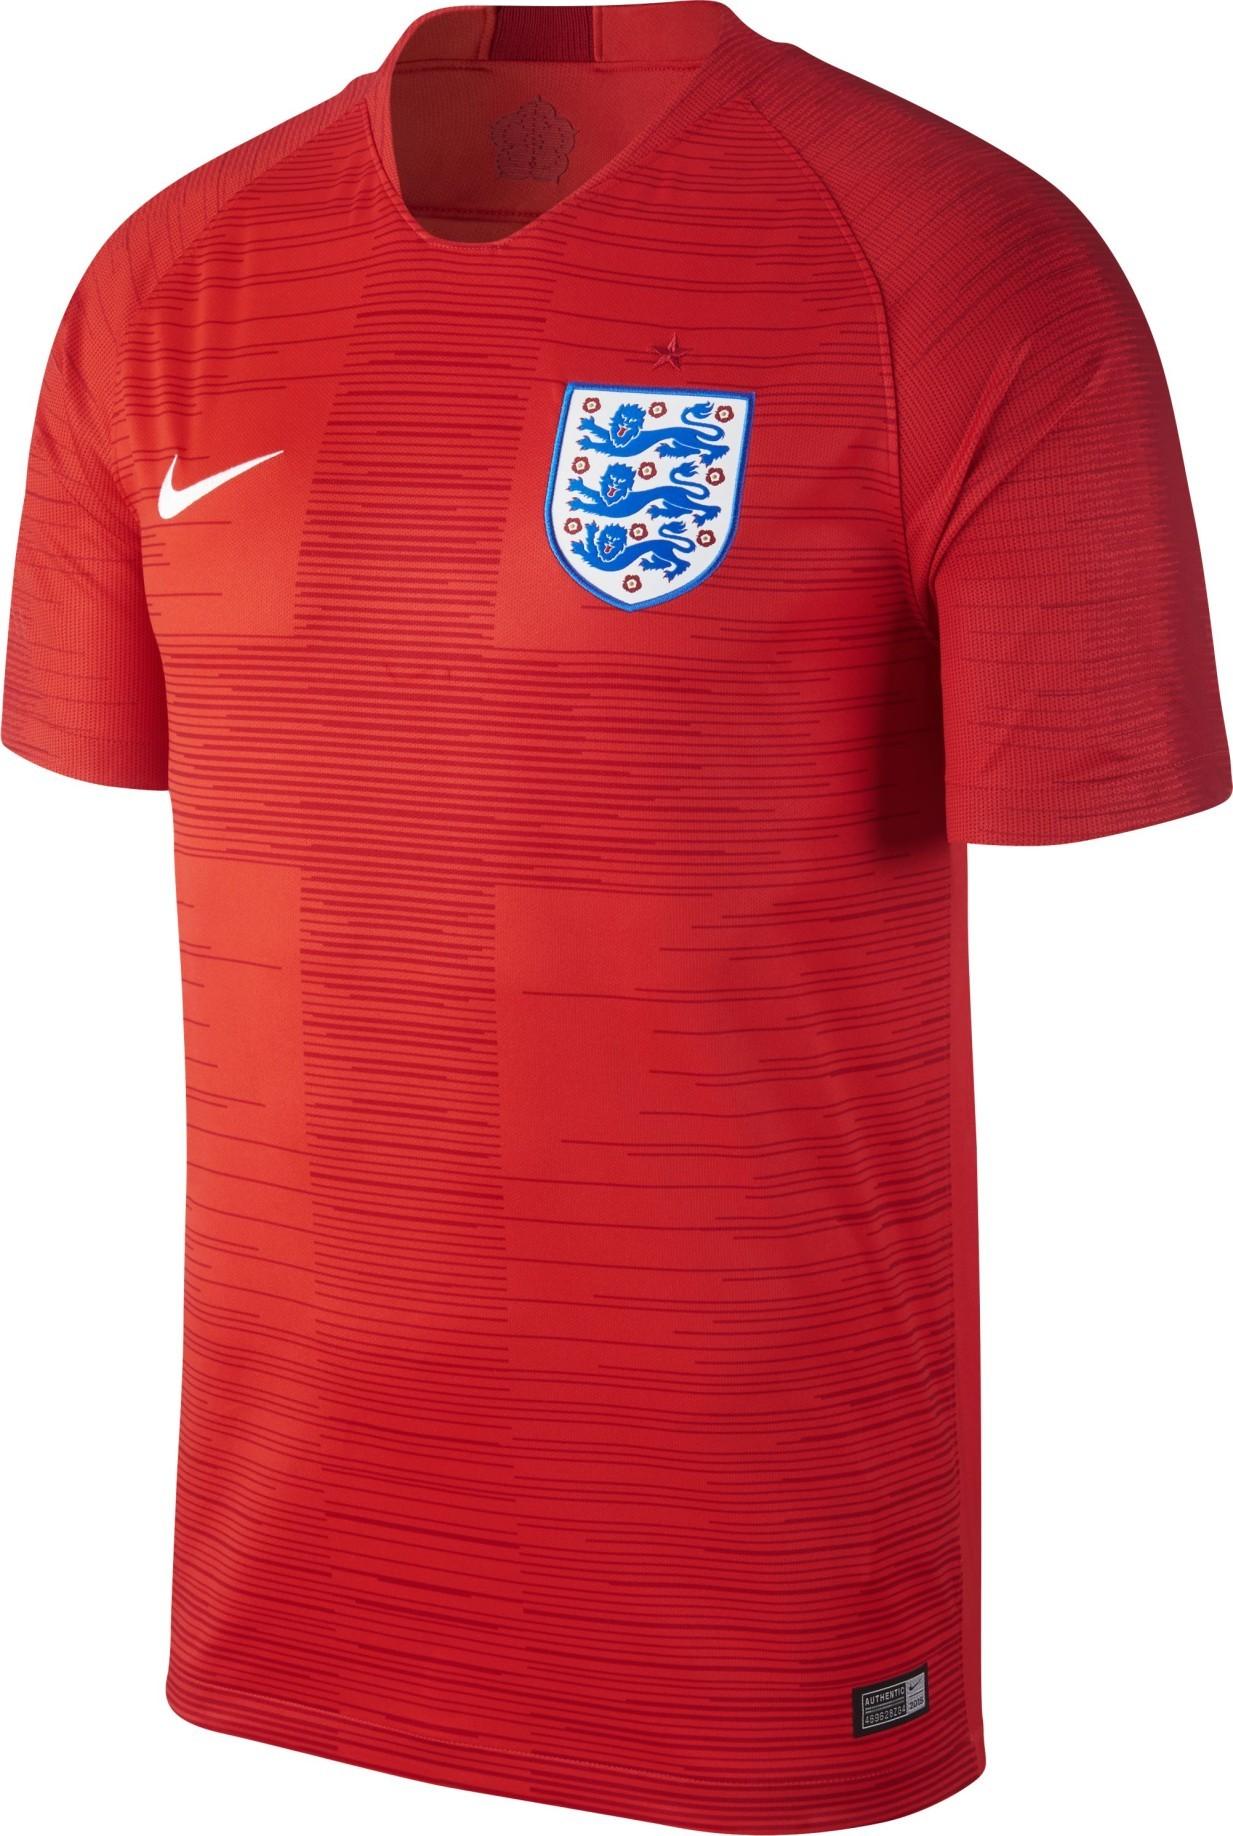 f2e72deb7 Jersey England Away 2018 colore Red - Nike - SportIT.com